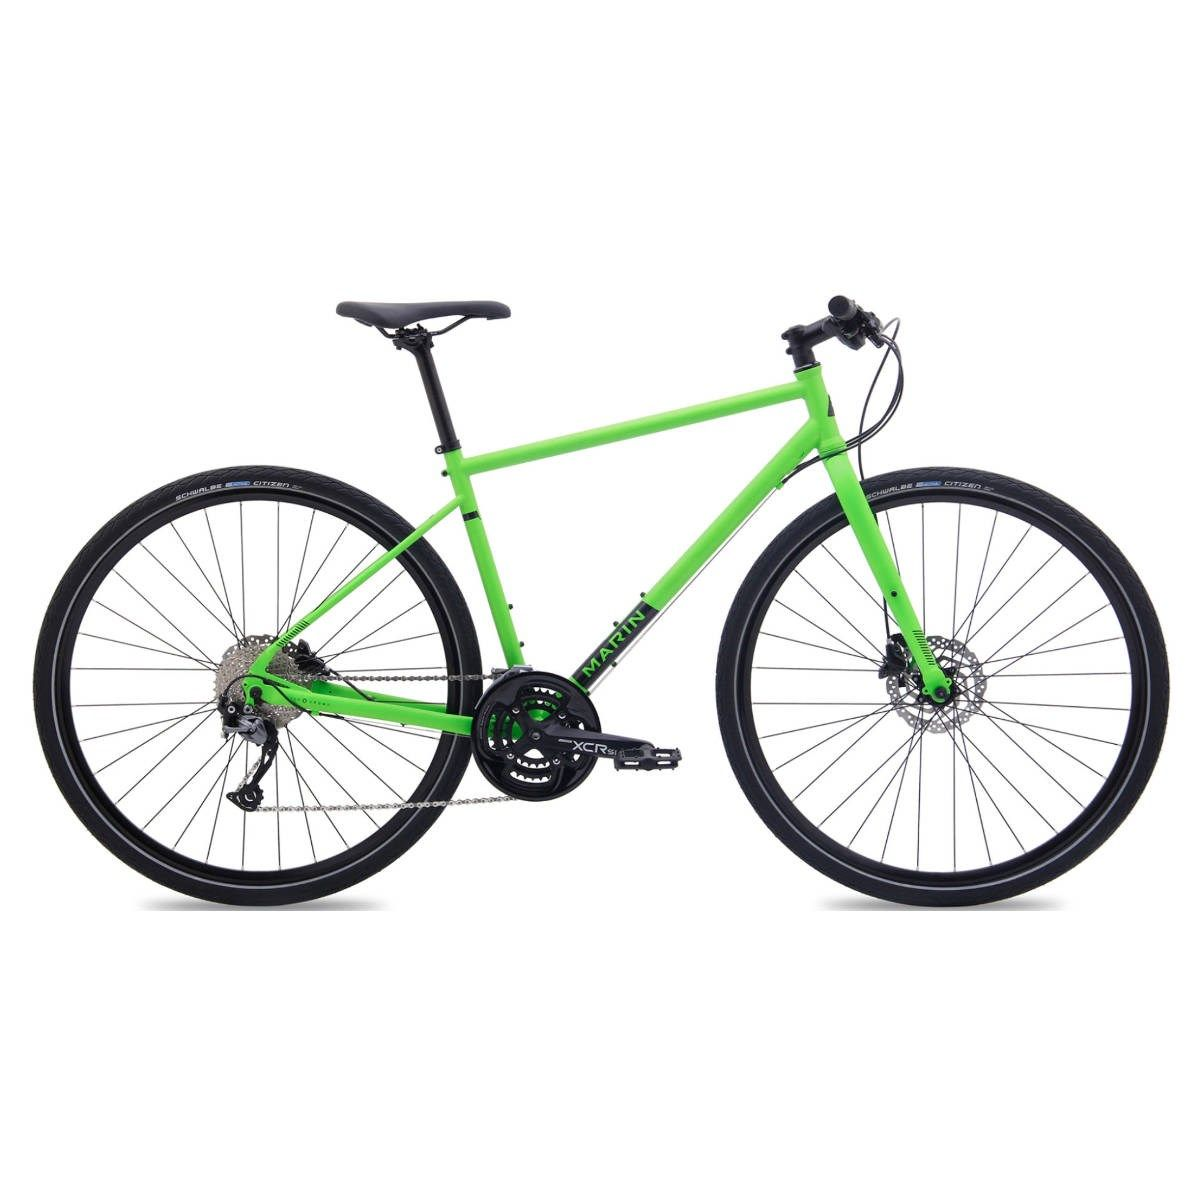 Marin Muirwoods 2018 Hybrid Bike Green Hybrid Bike Bike Bike Gear